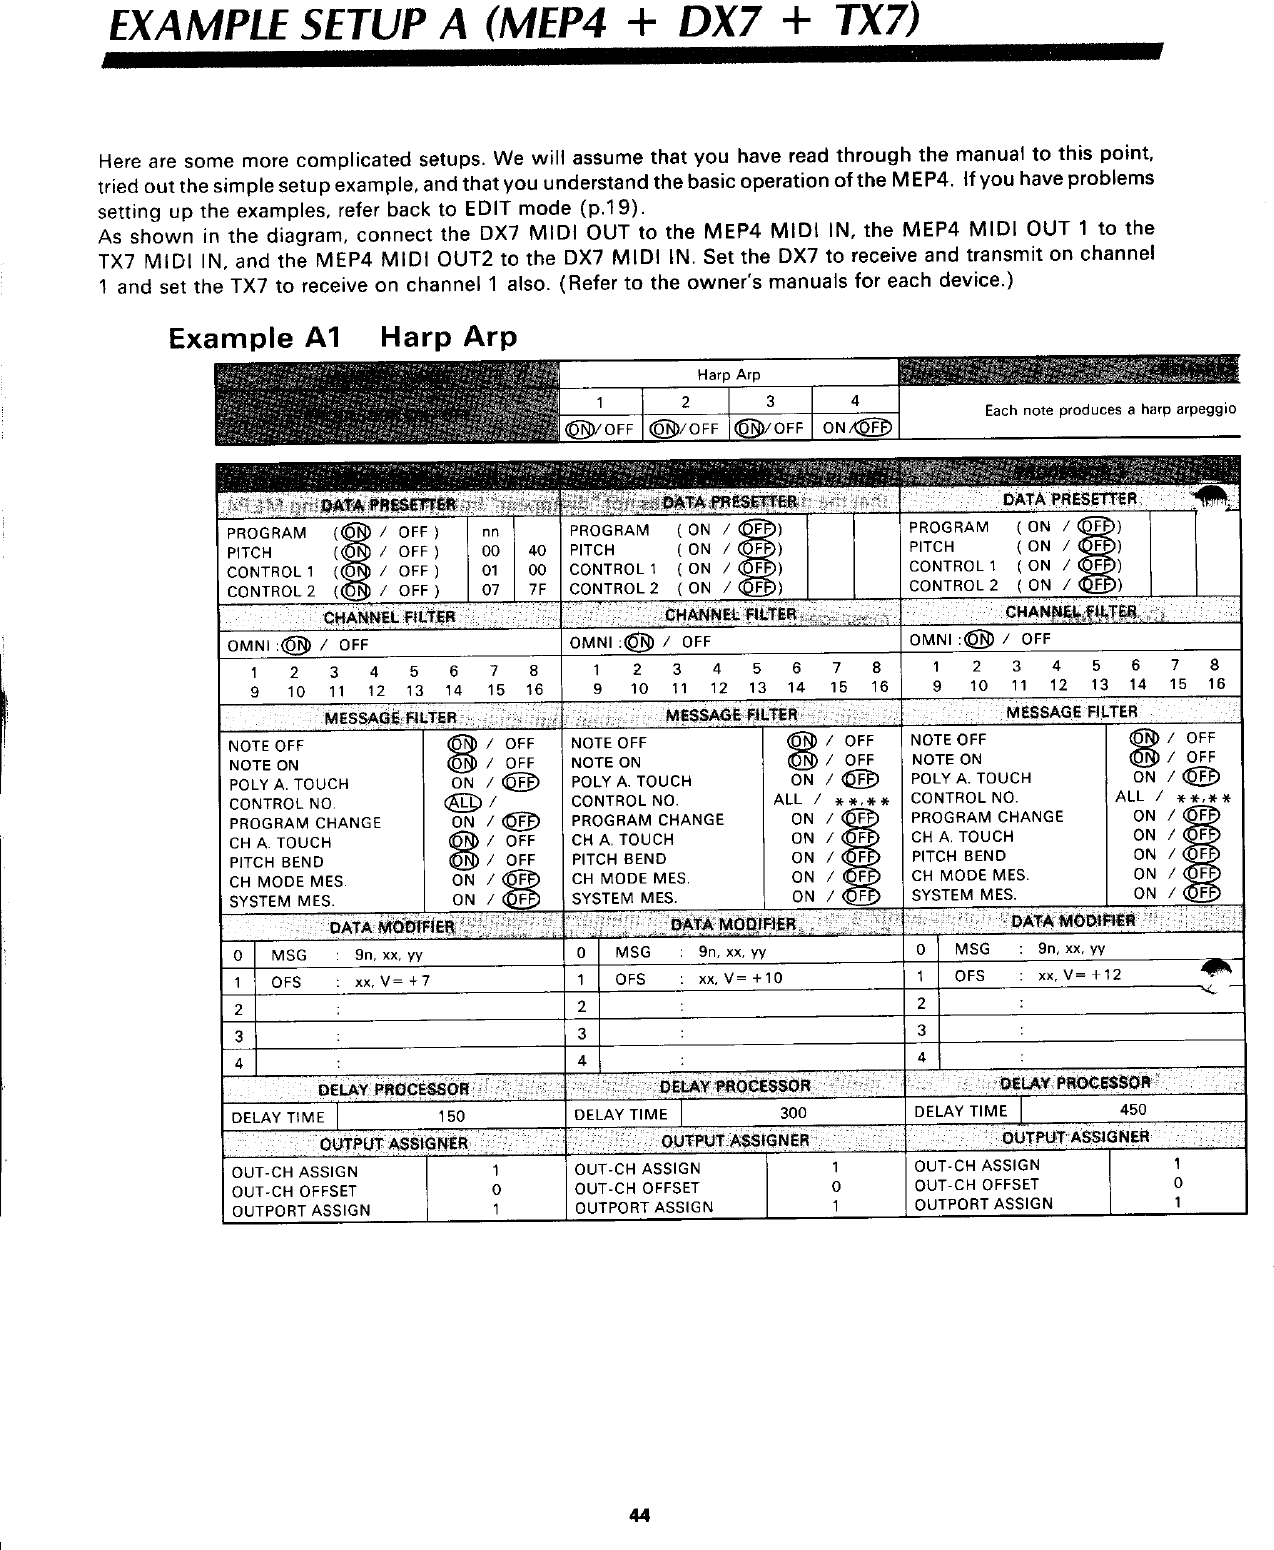 Yamaha MEP4 Owner's Manual (Image) MEP4E